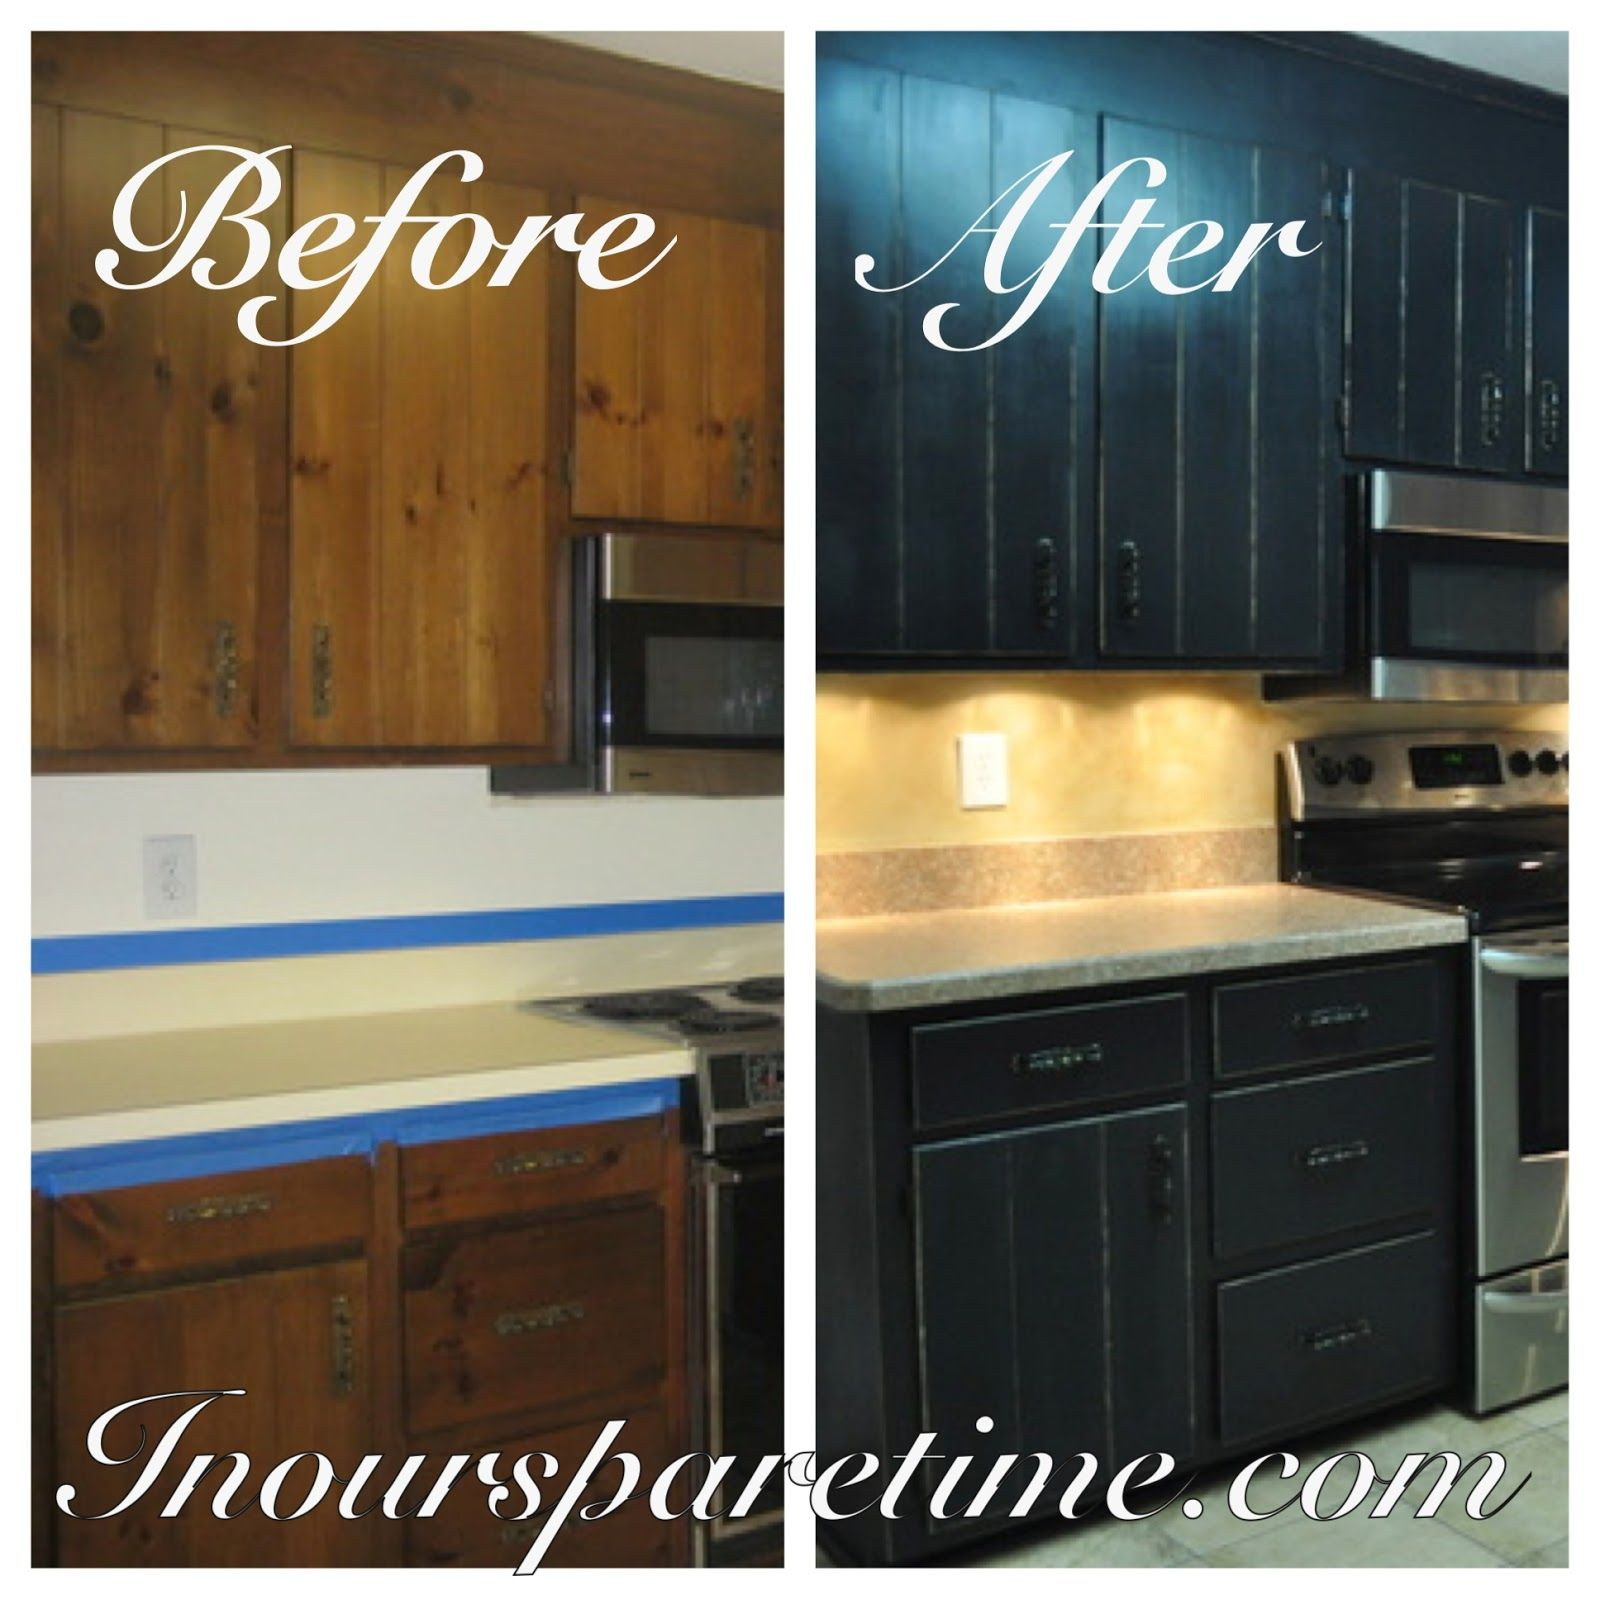 Facelift Kitchen Cabinet Doors   Kitchen Cabinets   Pinterest ...